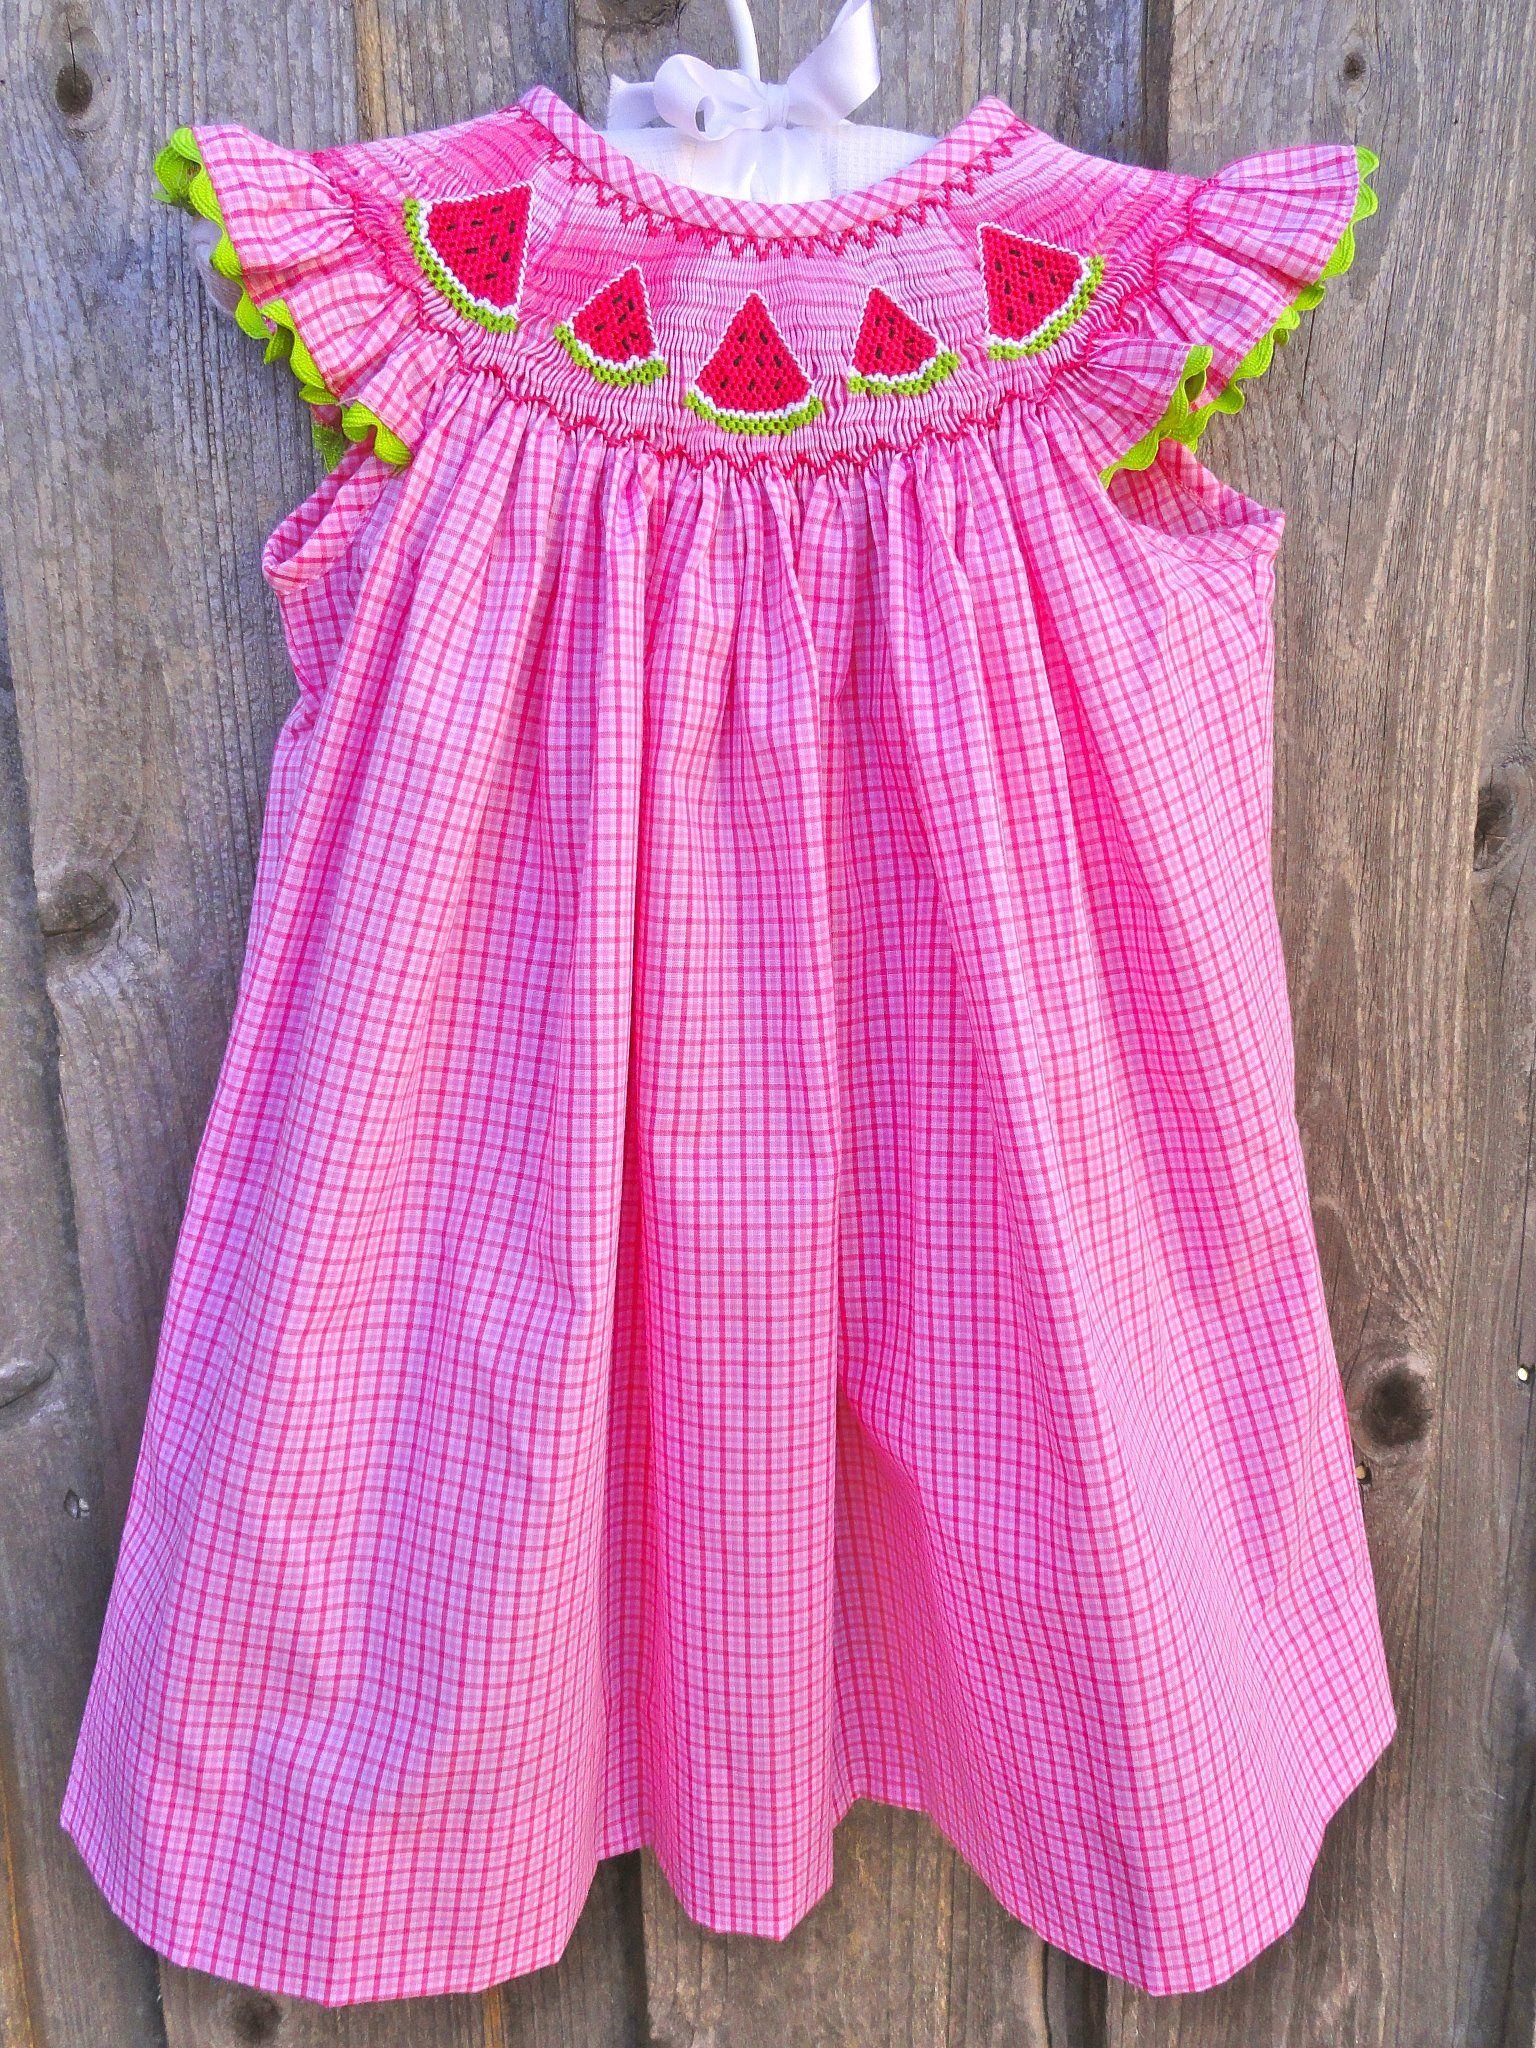 Pink Checked Smocked Watermelon Dress Summer Fun